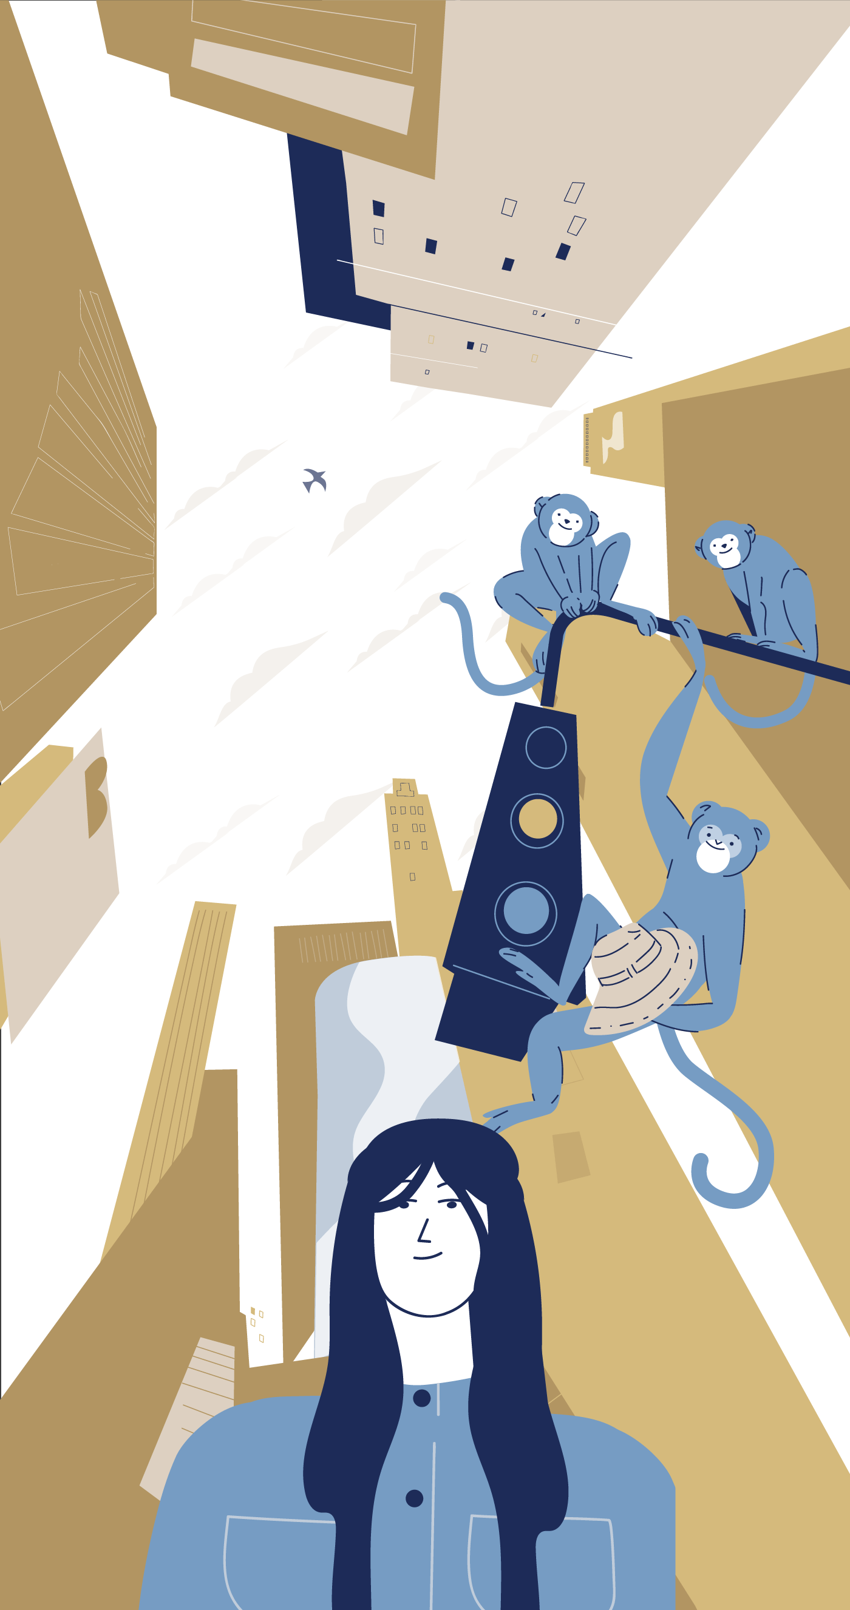 dreamcloud brand storytelling animation image